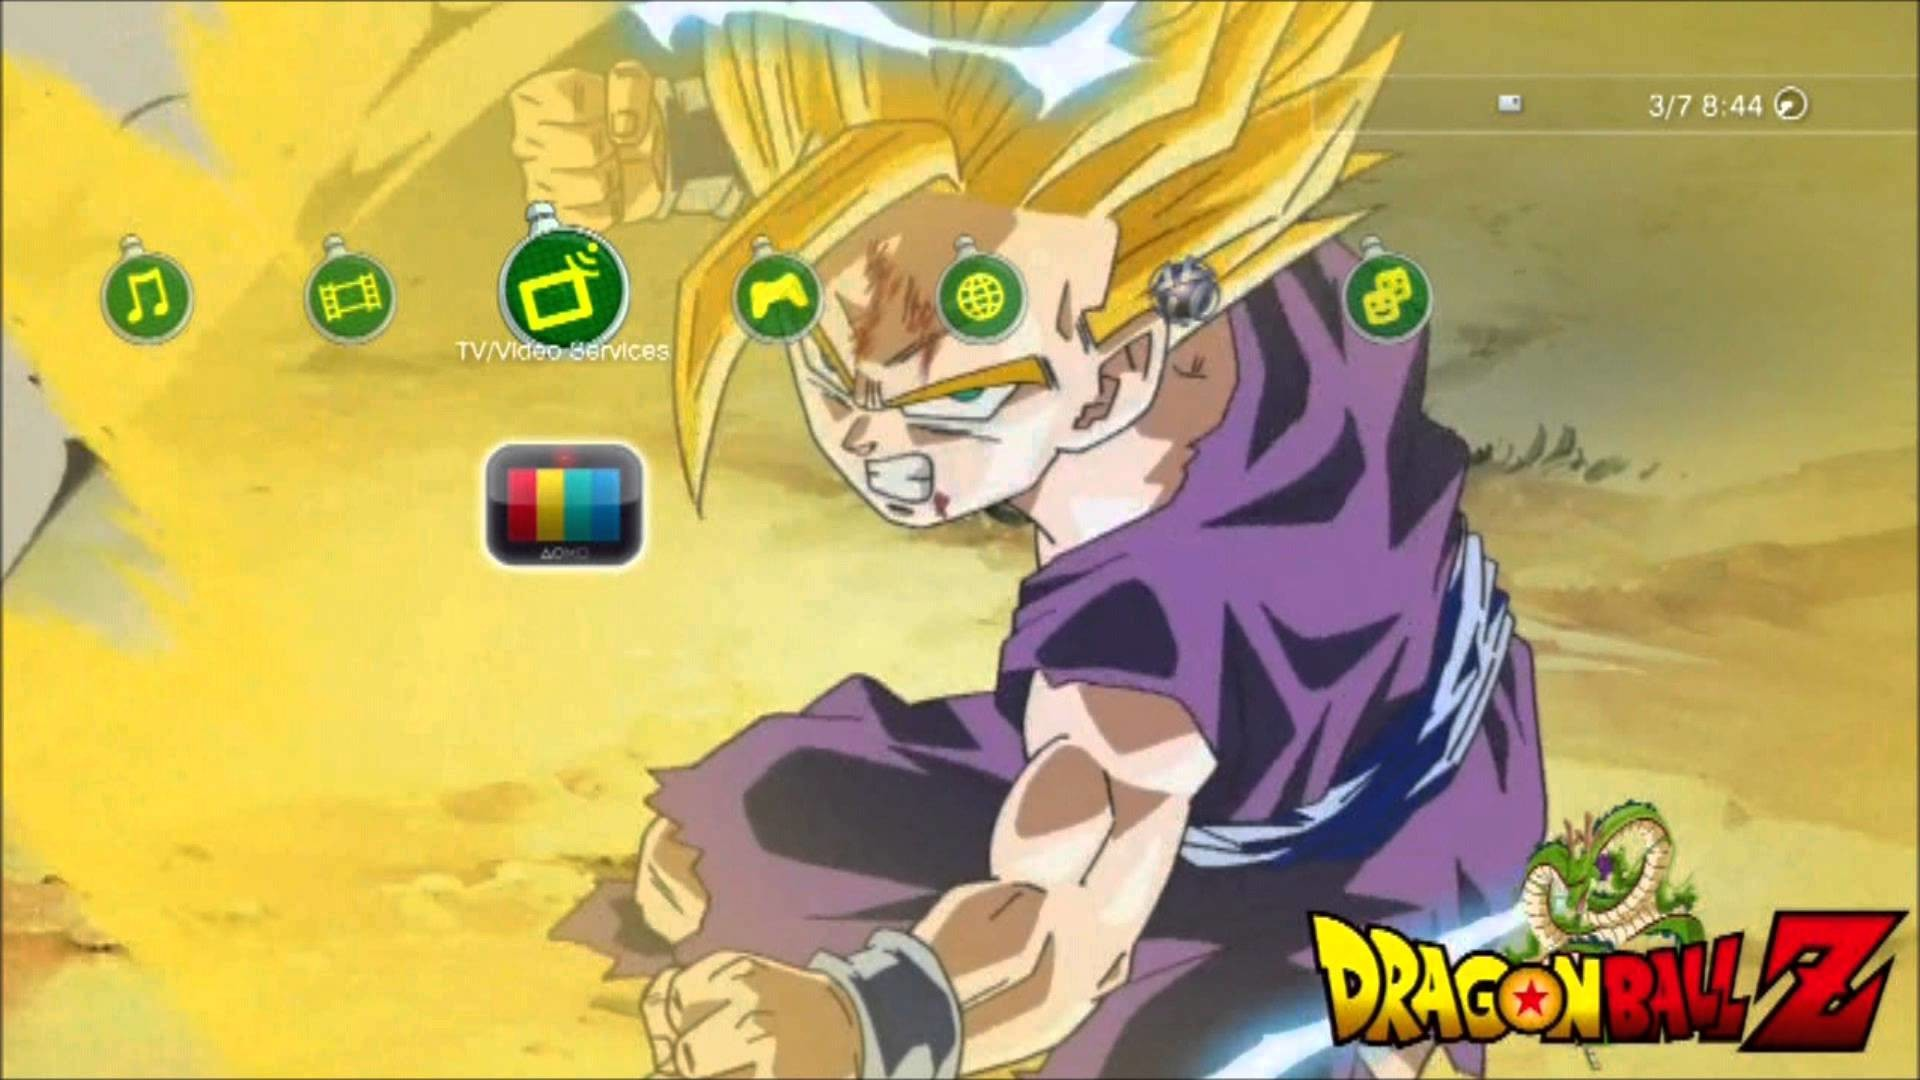 PS3 Dynamic Theme Dragon Ball Super Saiyan Gohan – YouTube